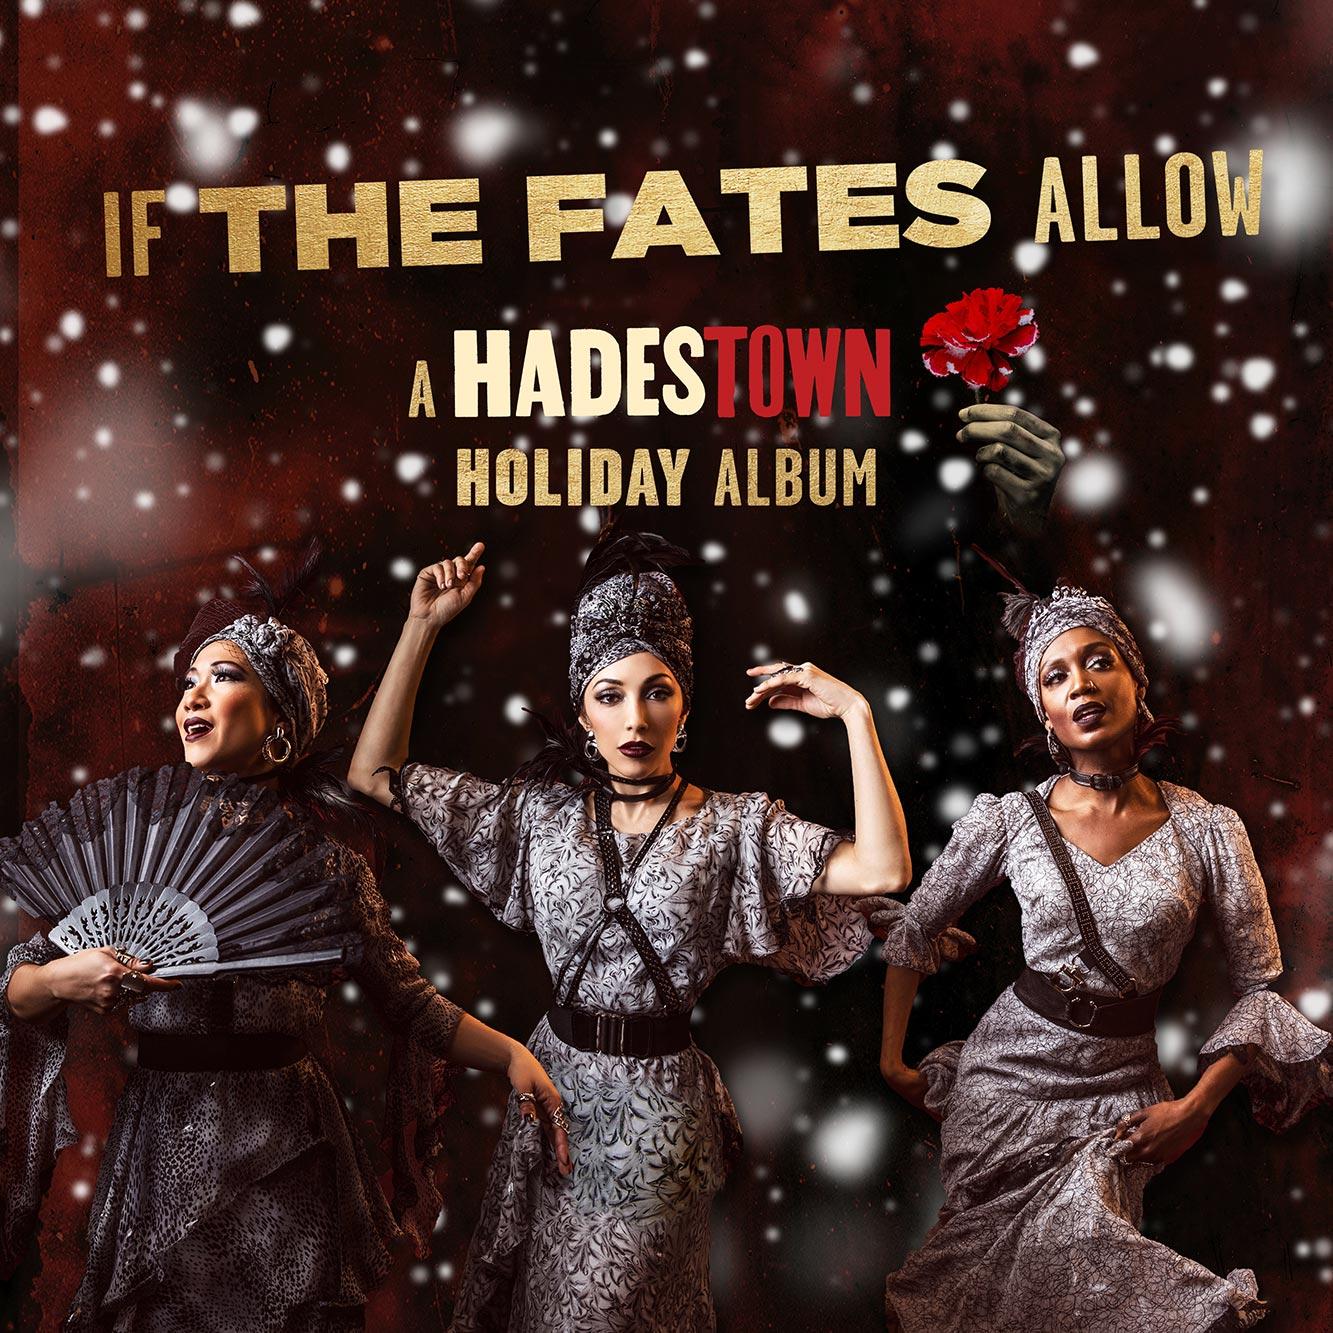 If the Fates AllowA Hadestown Holiday Album